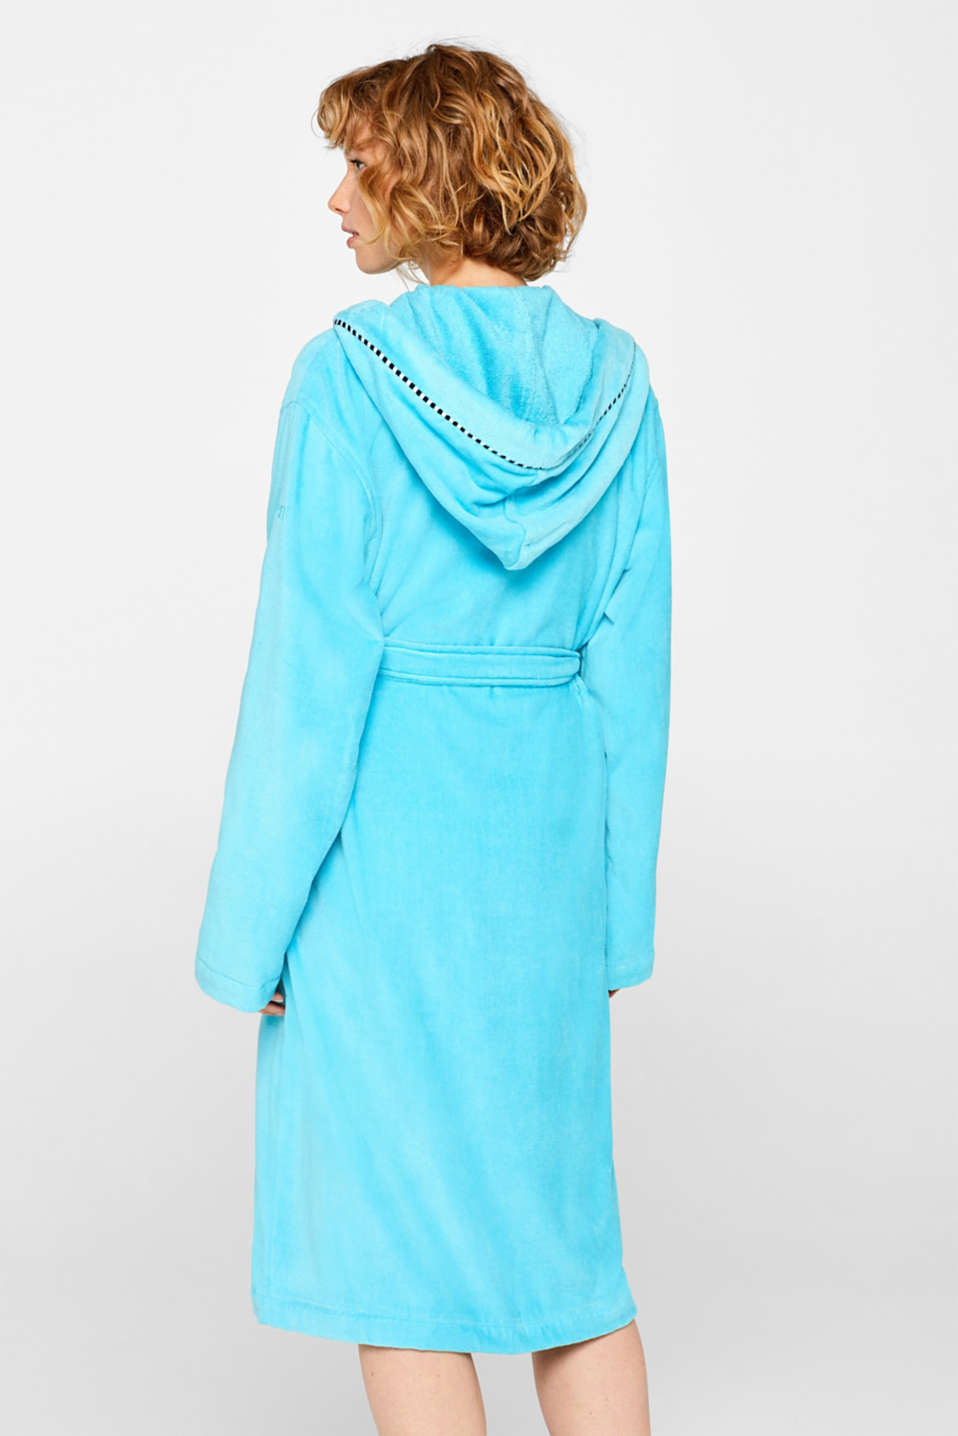 Unisex bathrobe made of 100% cotton, TURQUOISE, detail image number 2